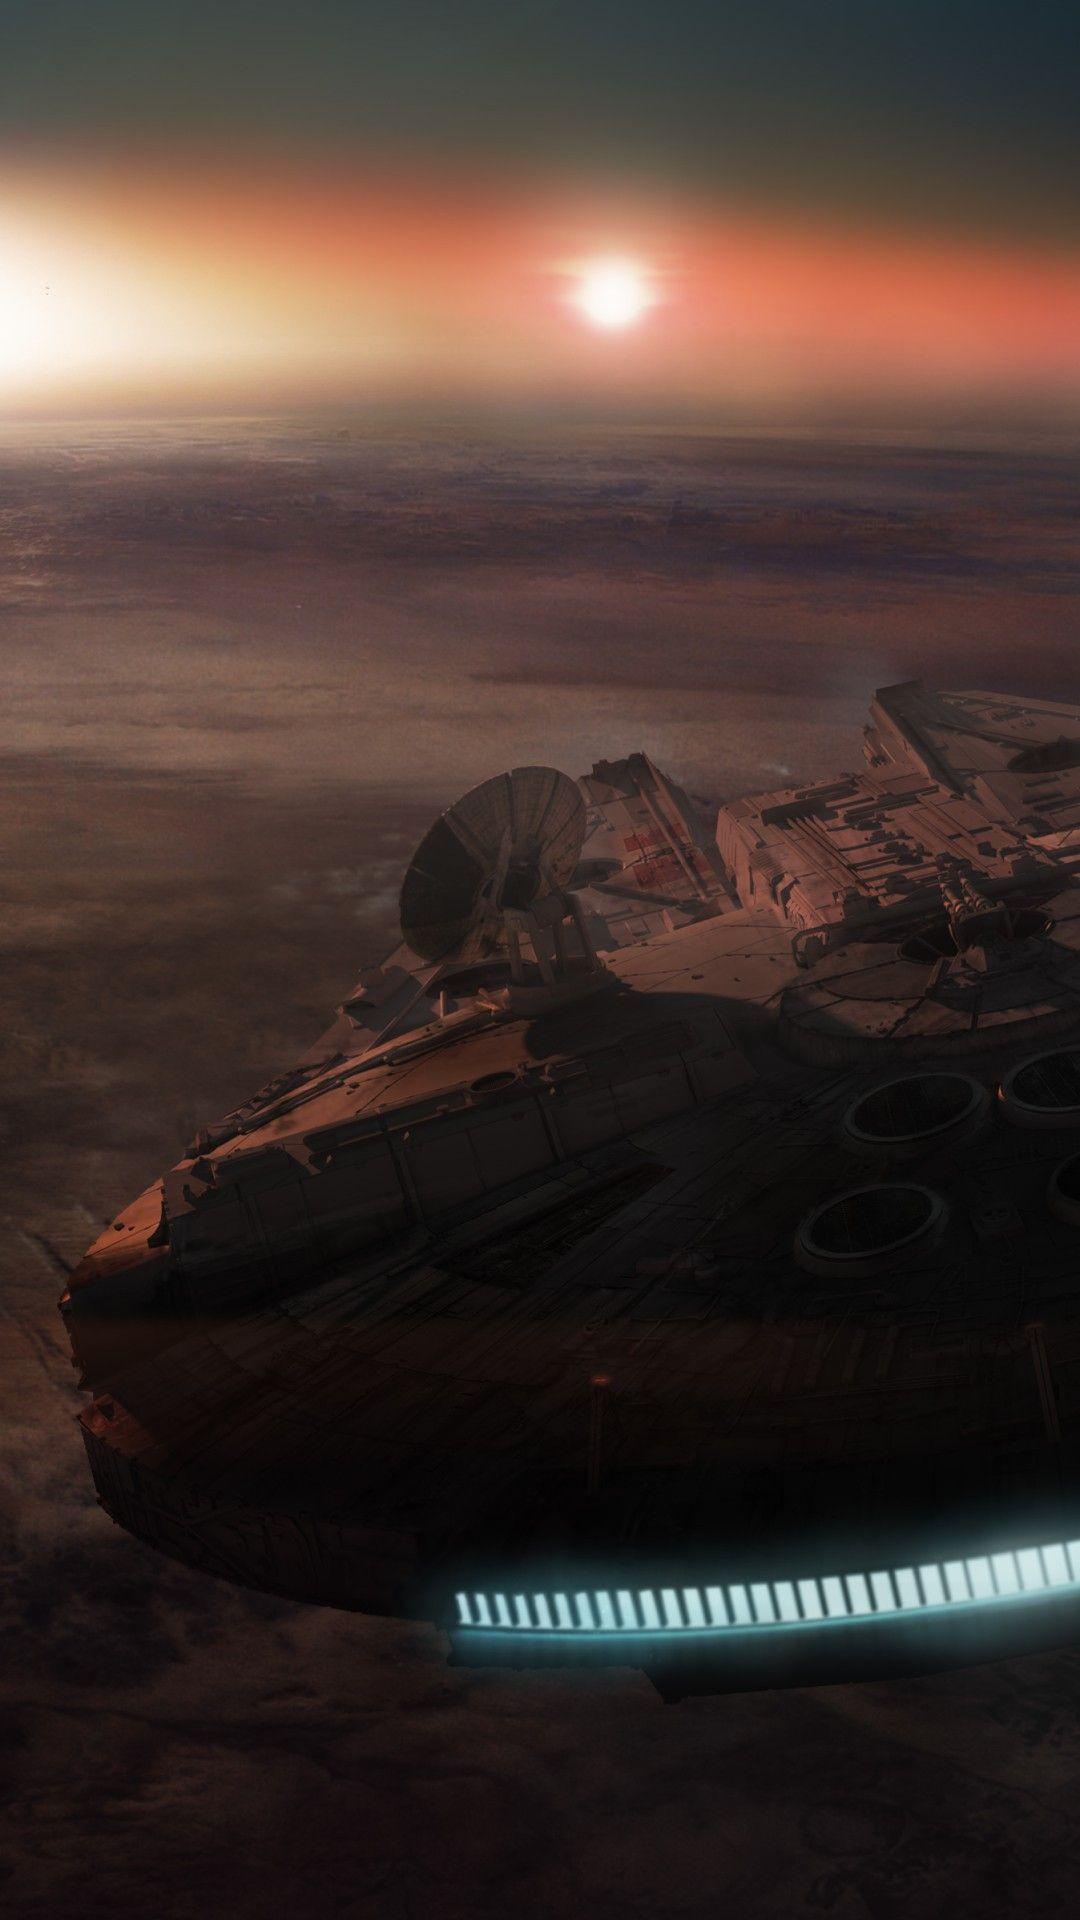 The Millennium Falcon Star Wars Star wars wallpaper